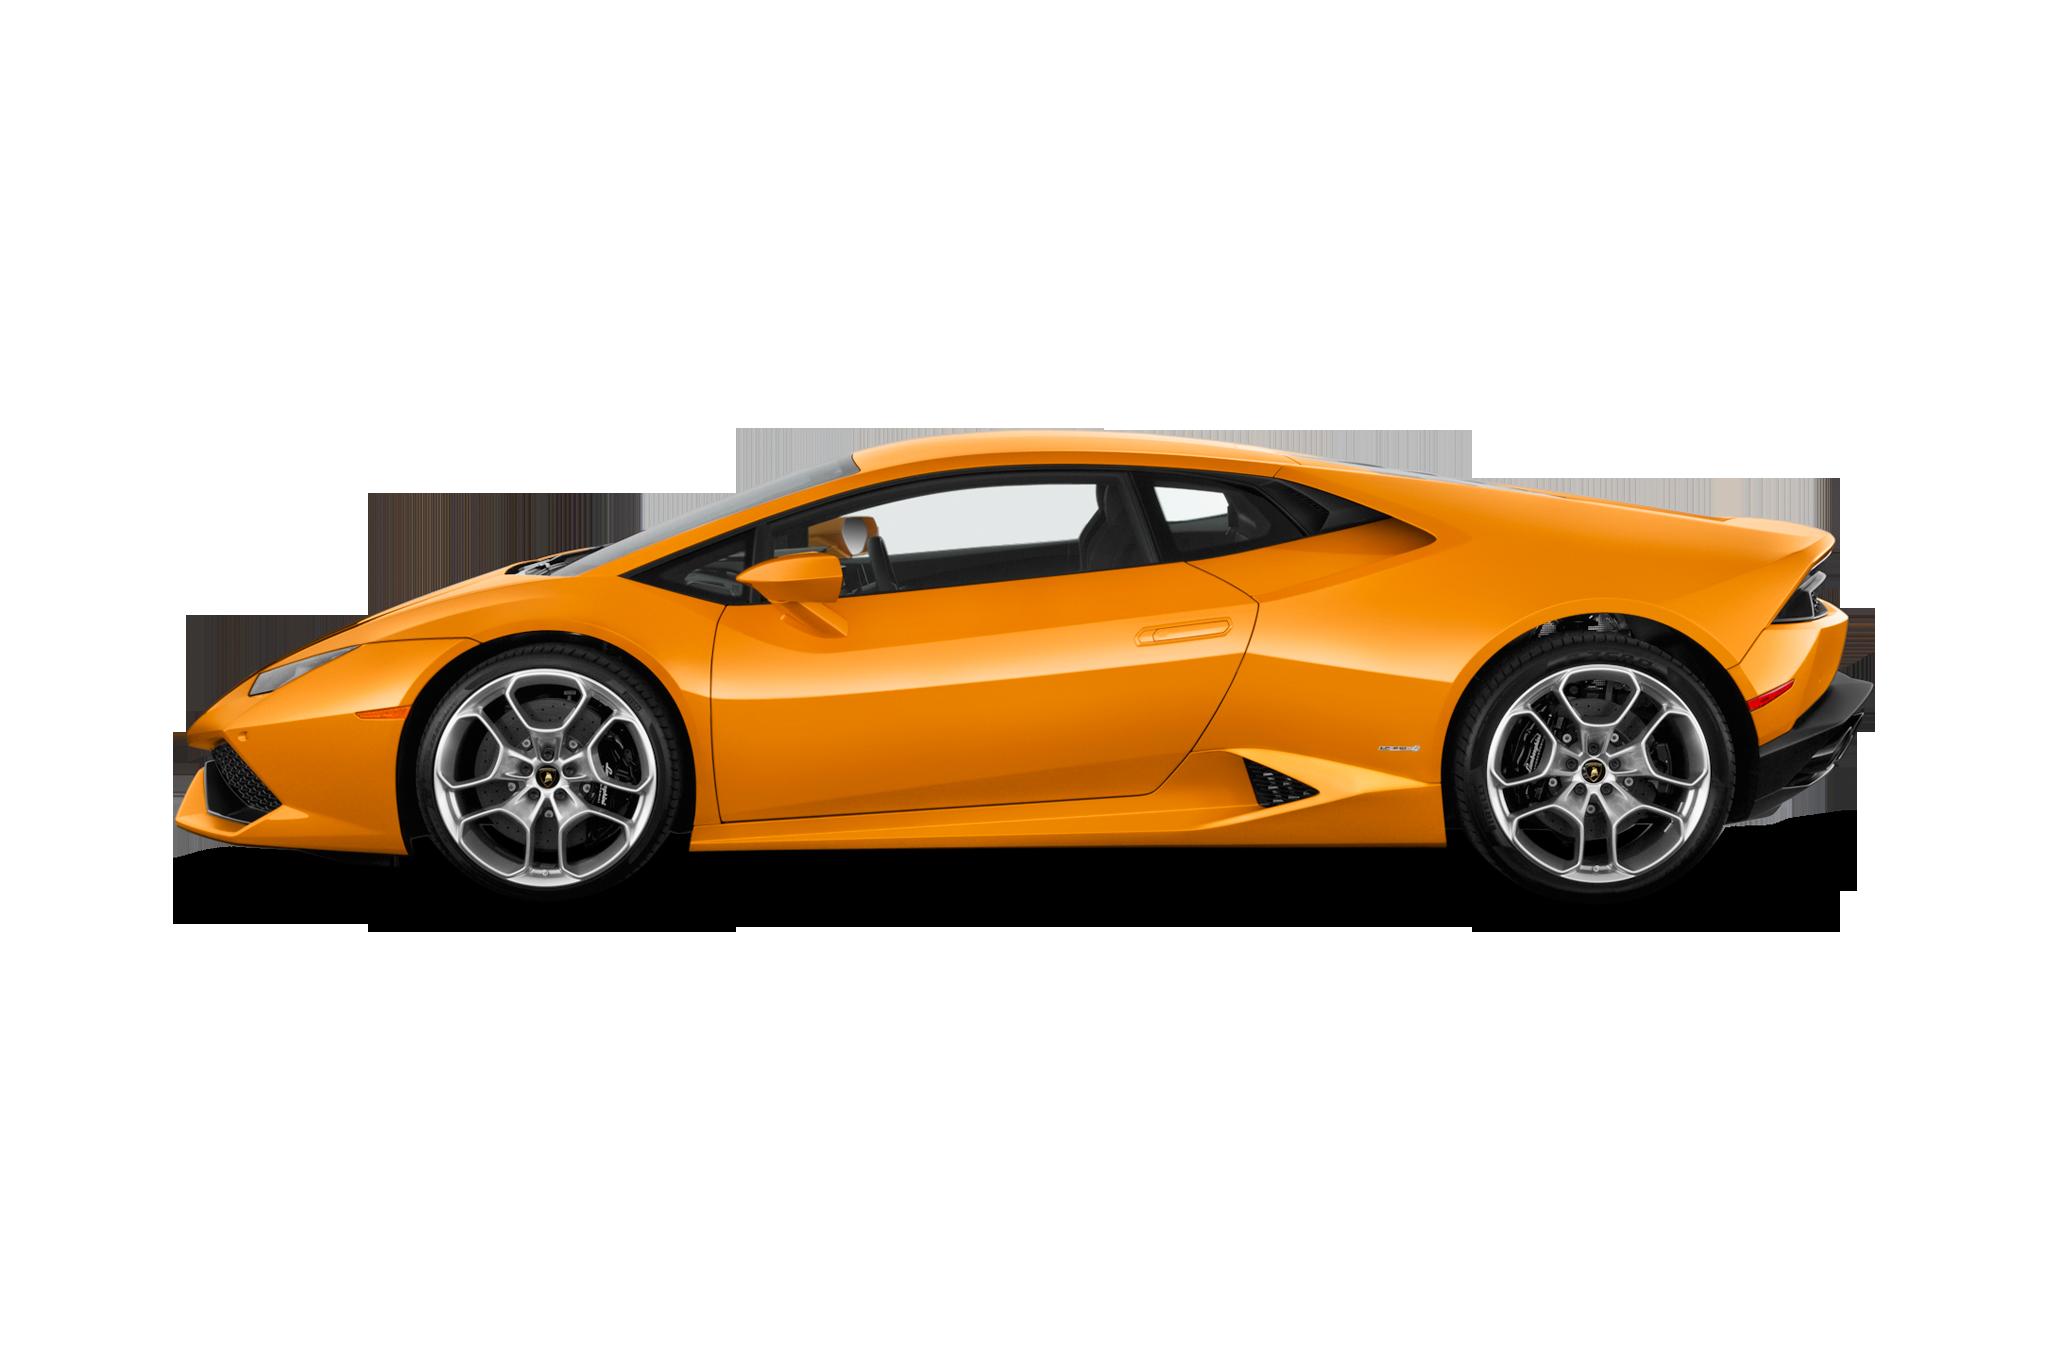 Car show clipart banner transparent library First U.S. Customer Receives Lamborghini Centenario | Automobile ... banner transparent library